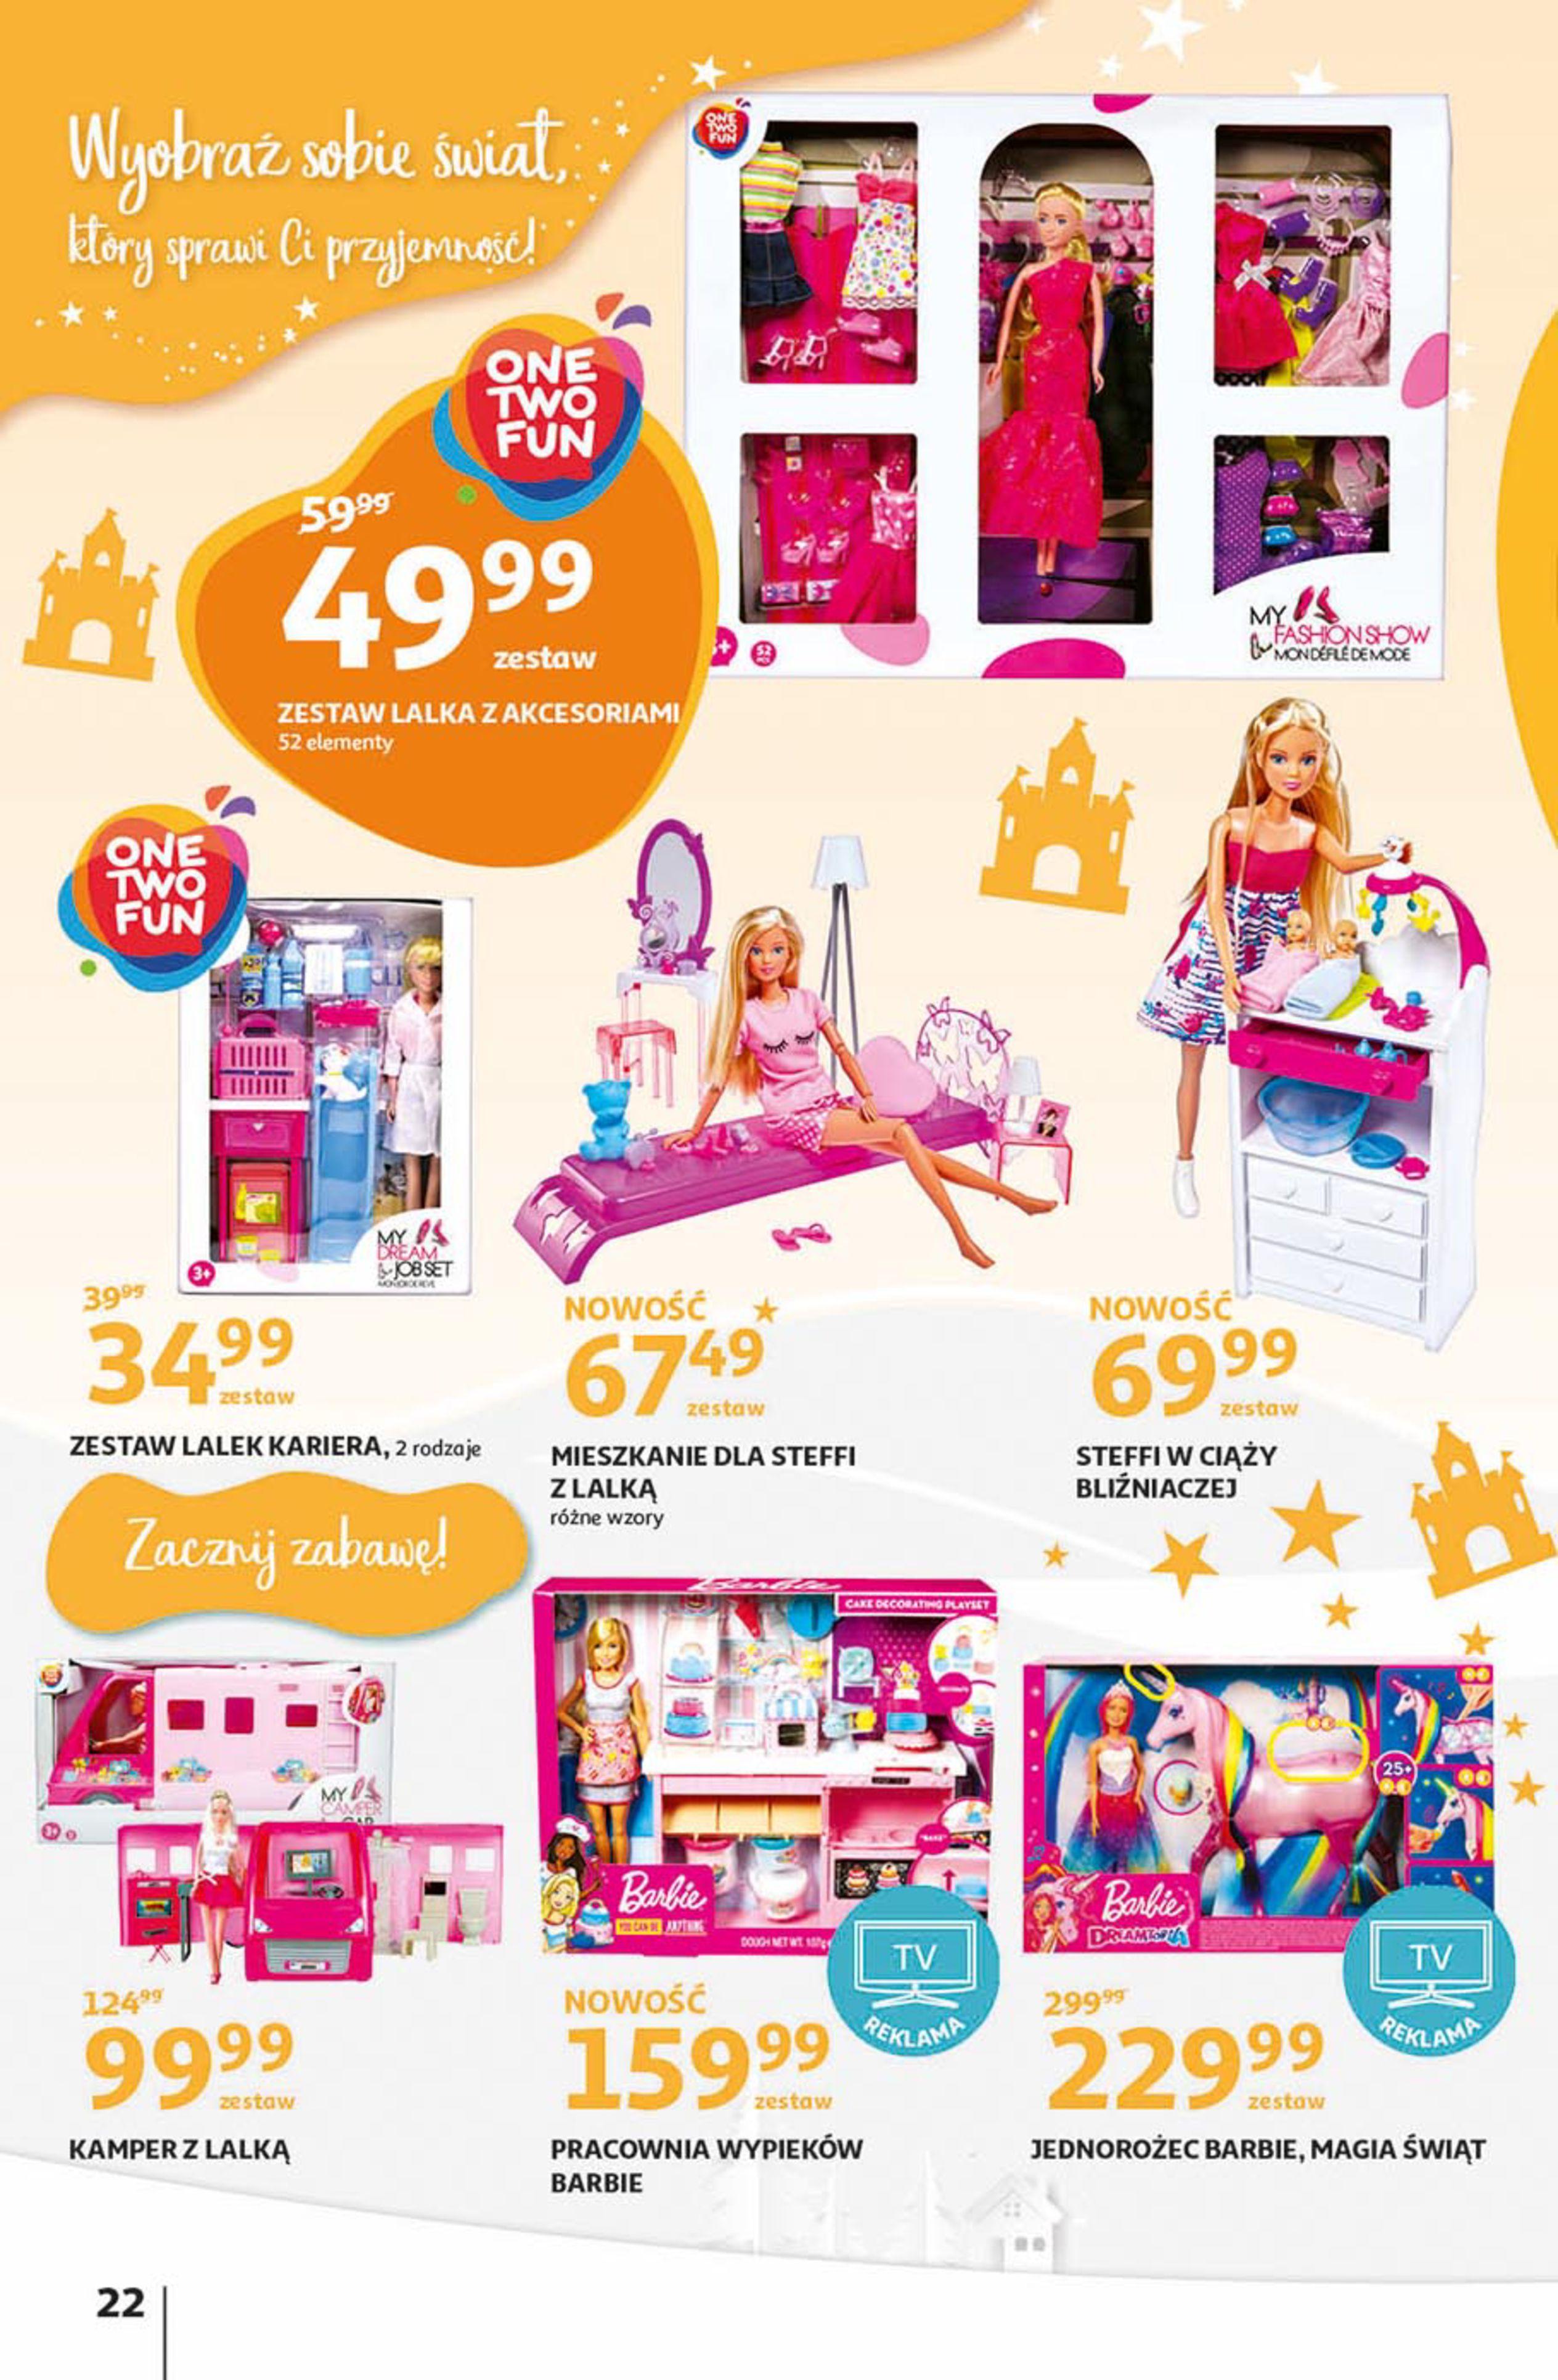 Gazetka Auchan - Magia zabawek Hipermarkety-06.11.2019-20.11.2019-page-22